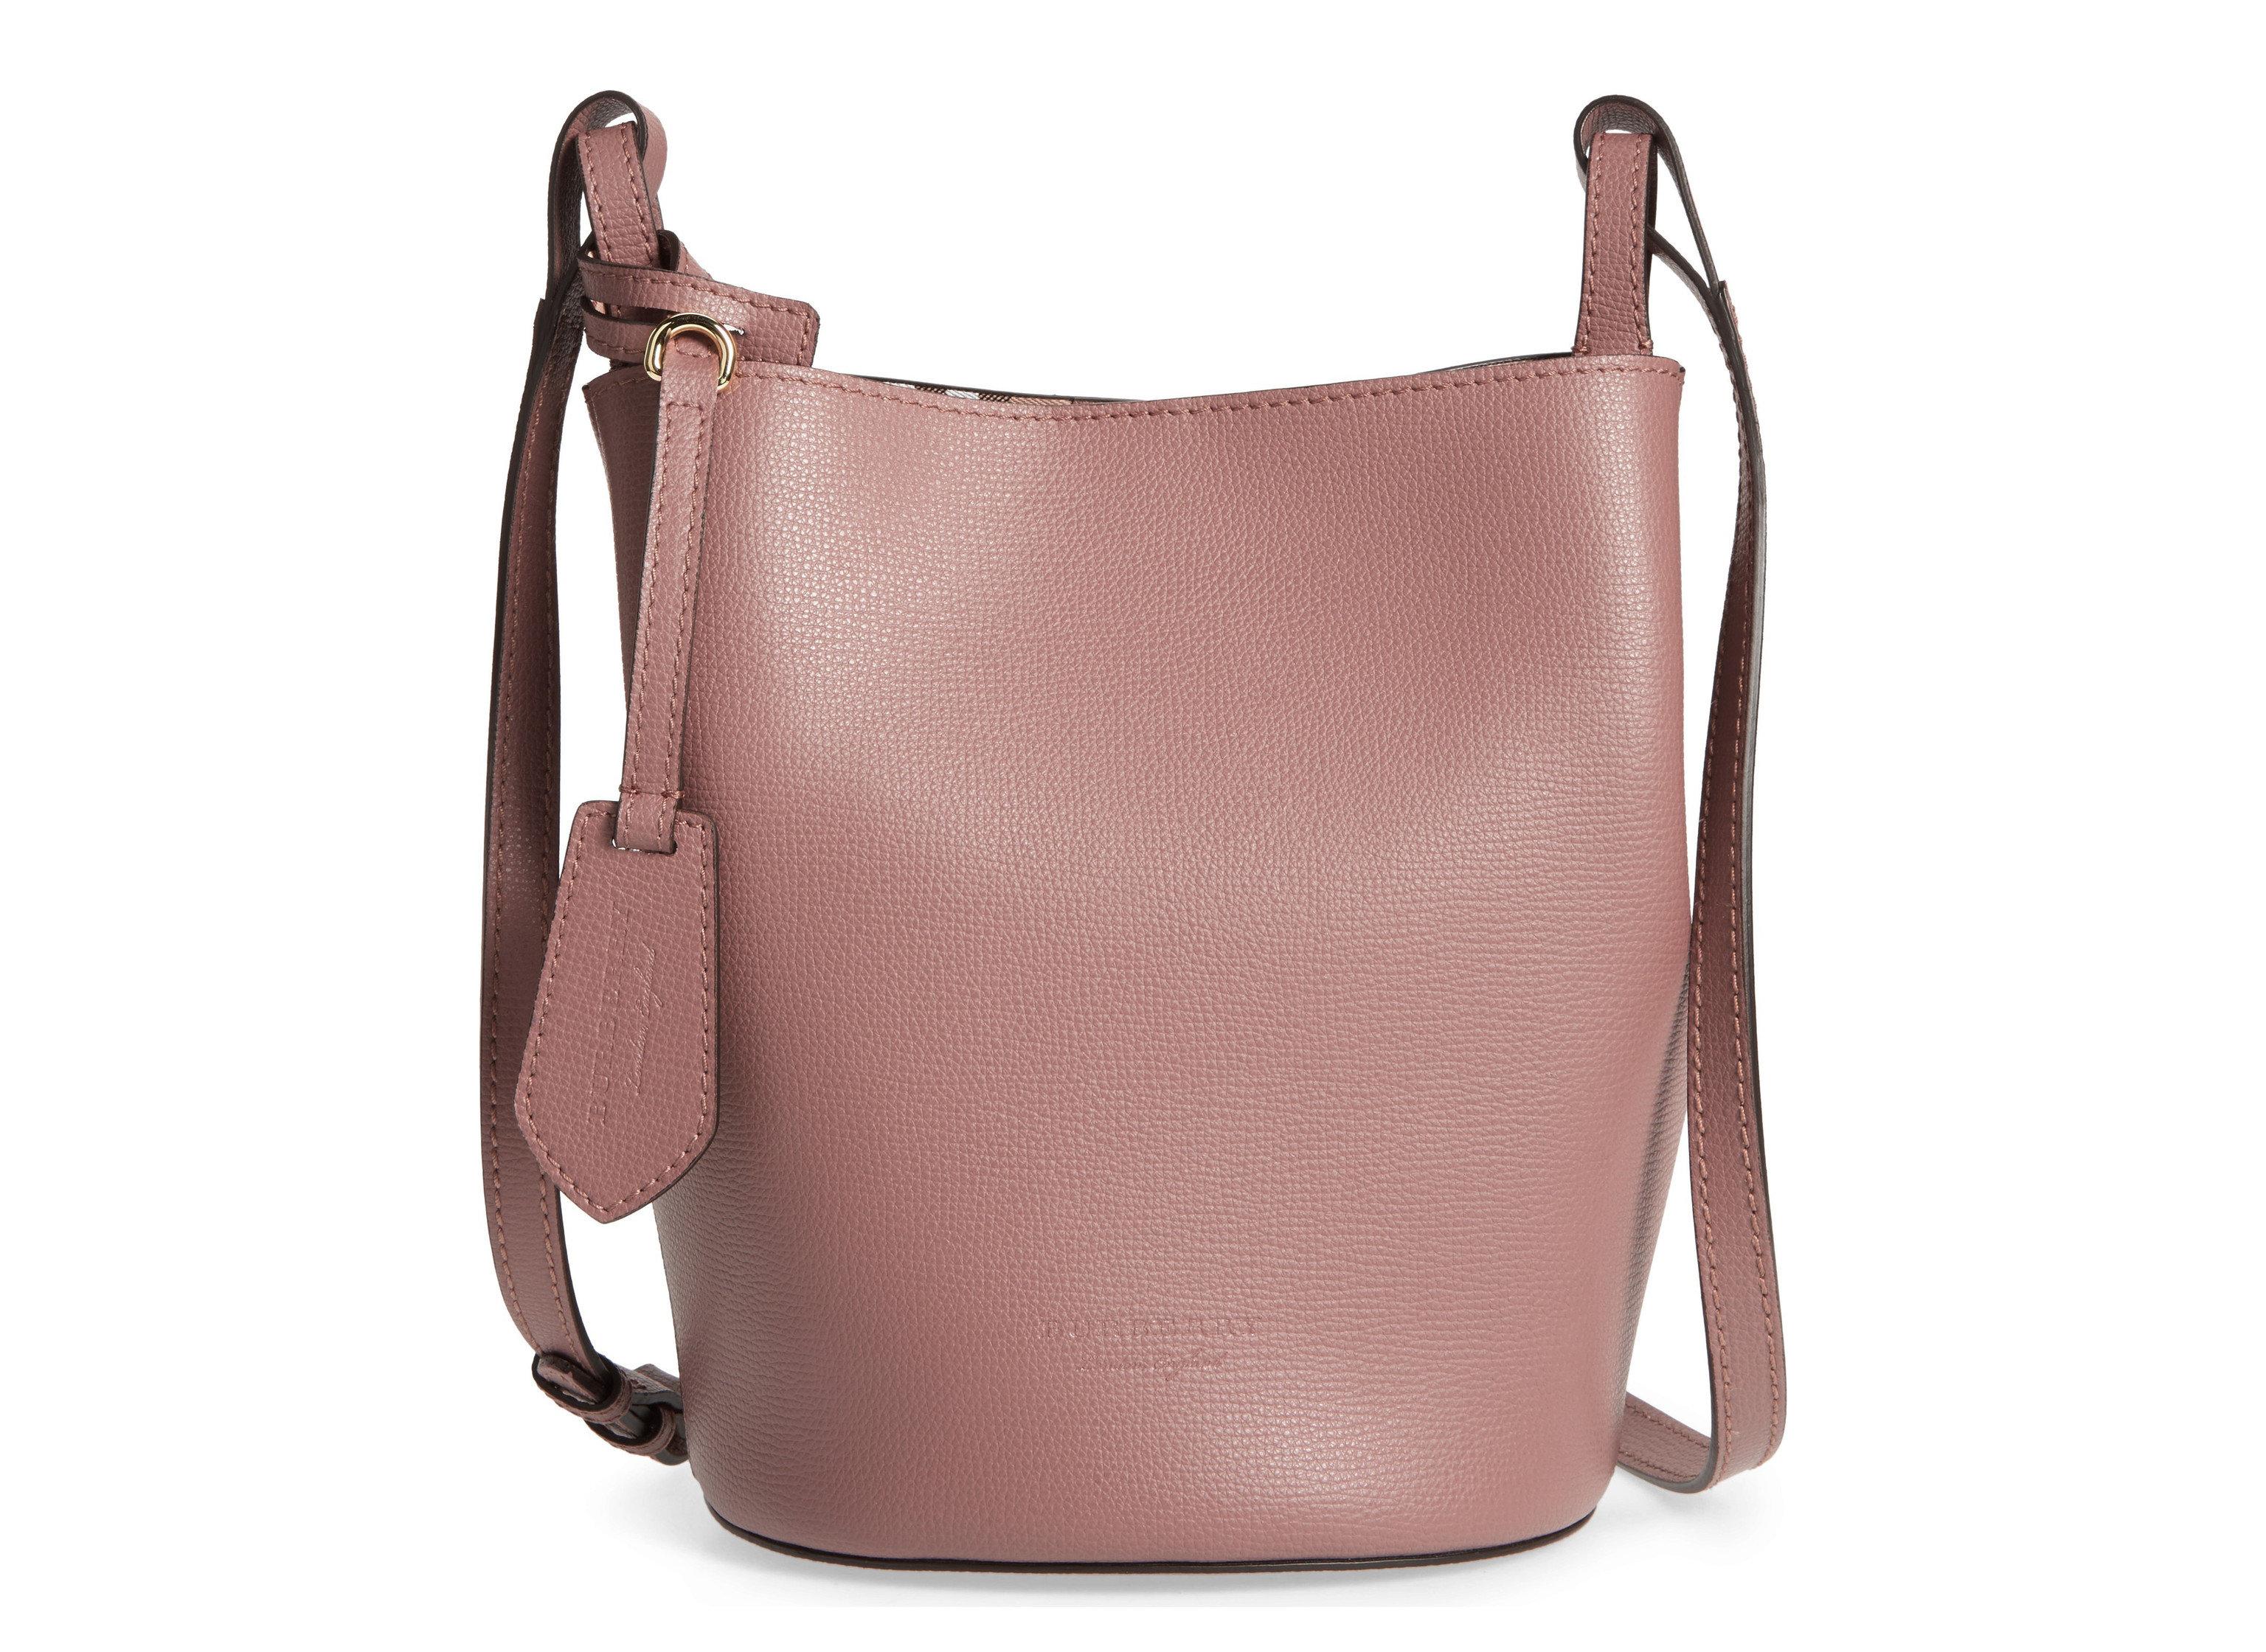 Style + Design Travel Shop bag pink shoulder bag accessory brown leather handbag fashion accessory product product design beige peach case